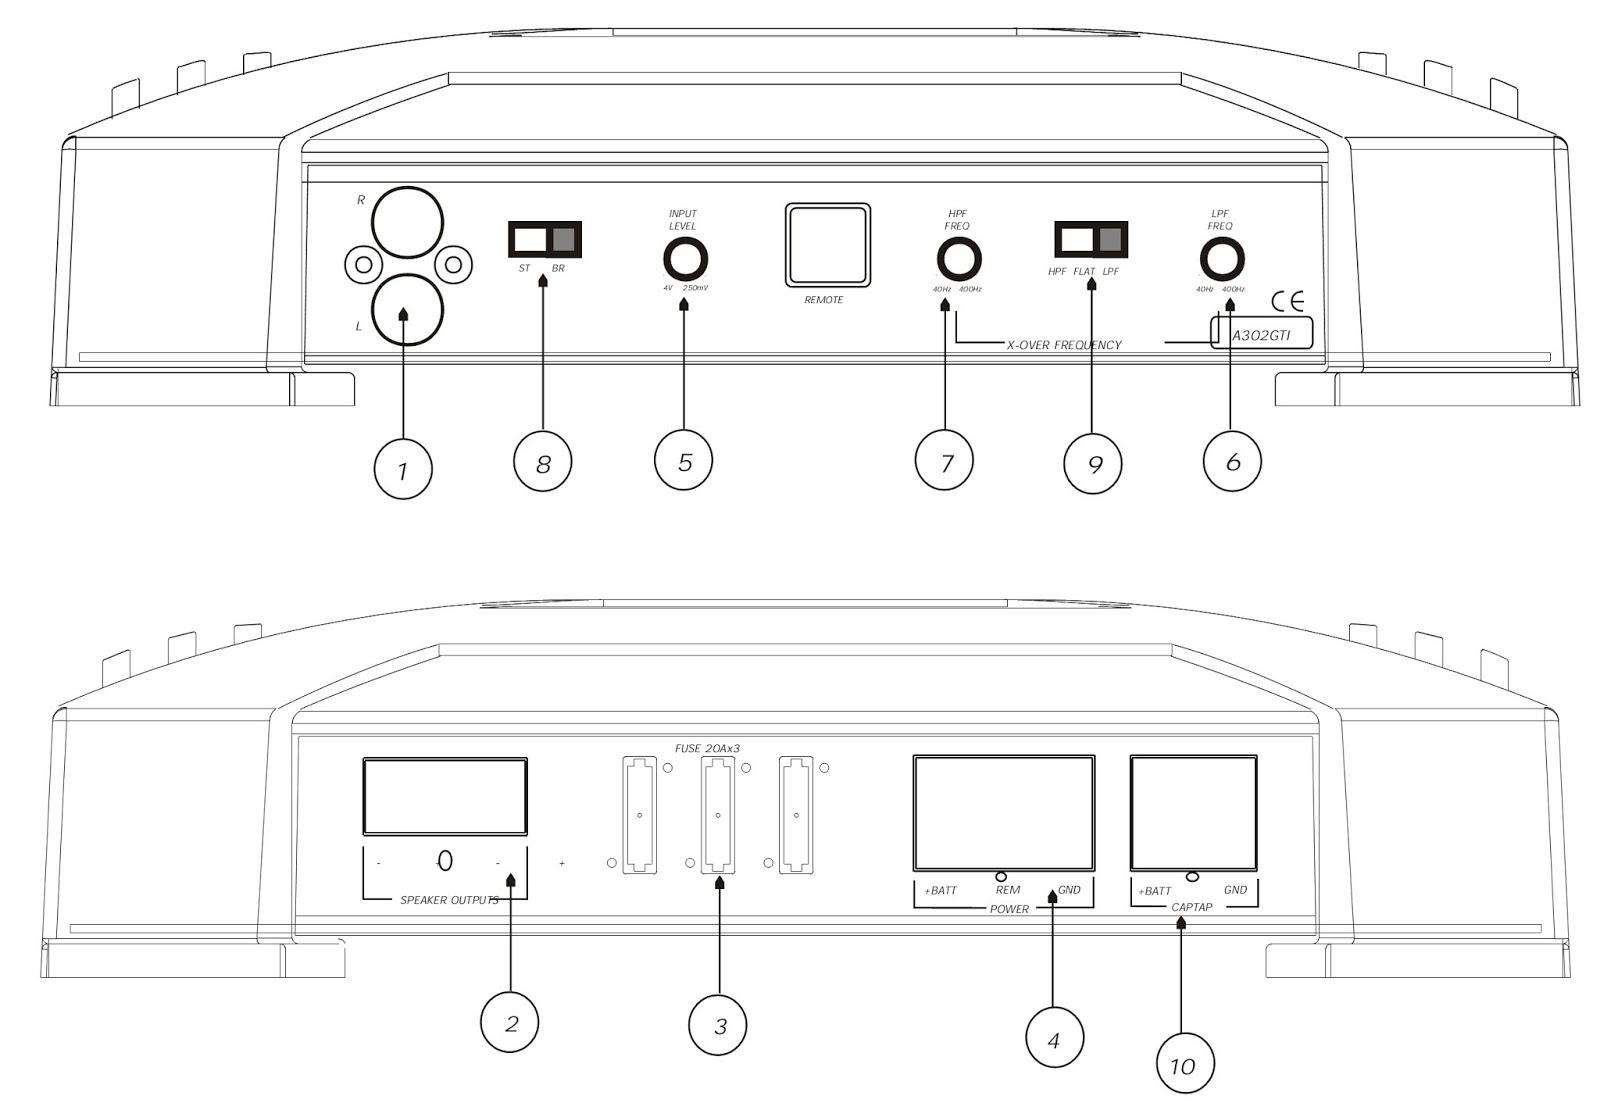 Car Amplifier Wiring Diagram Ht2000 Motherboard Jbl A302gti Amp Schematic